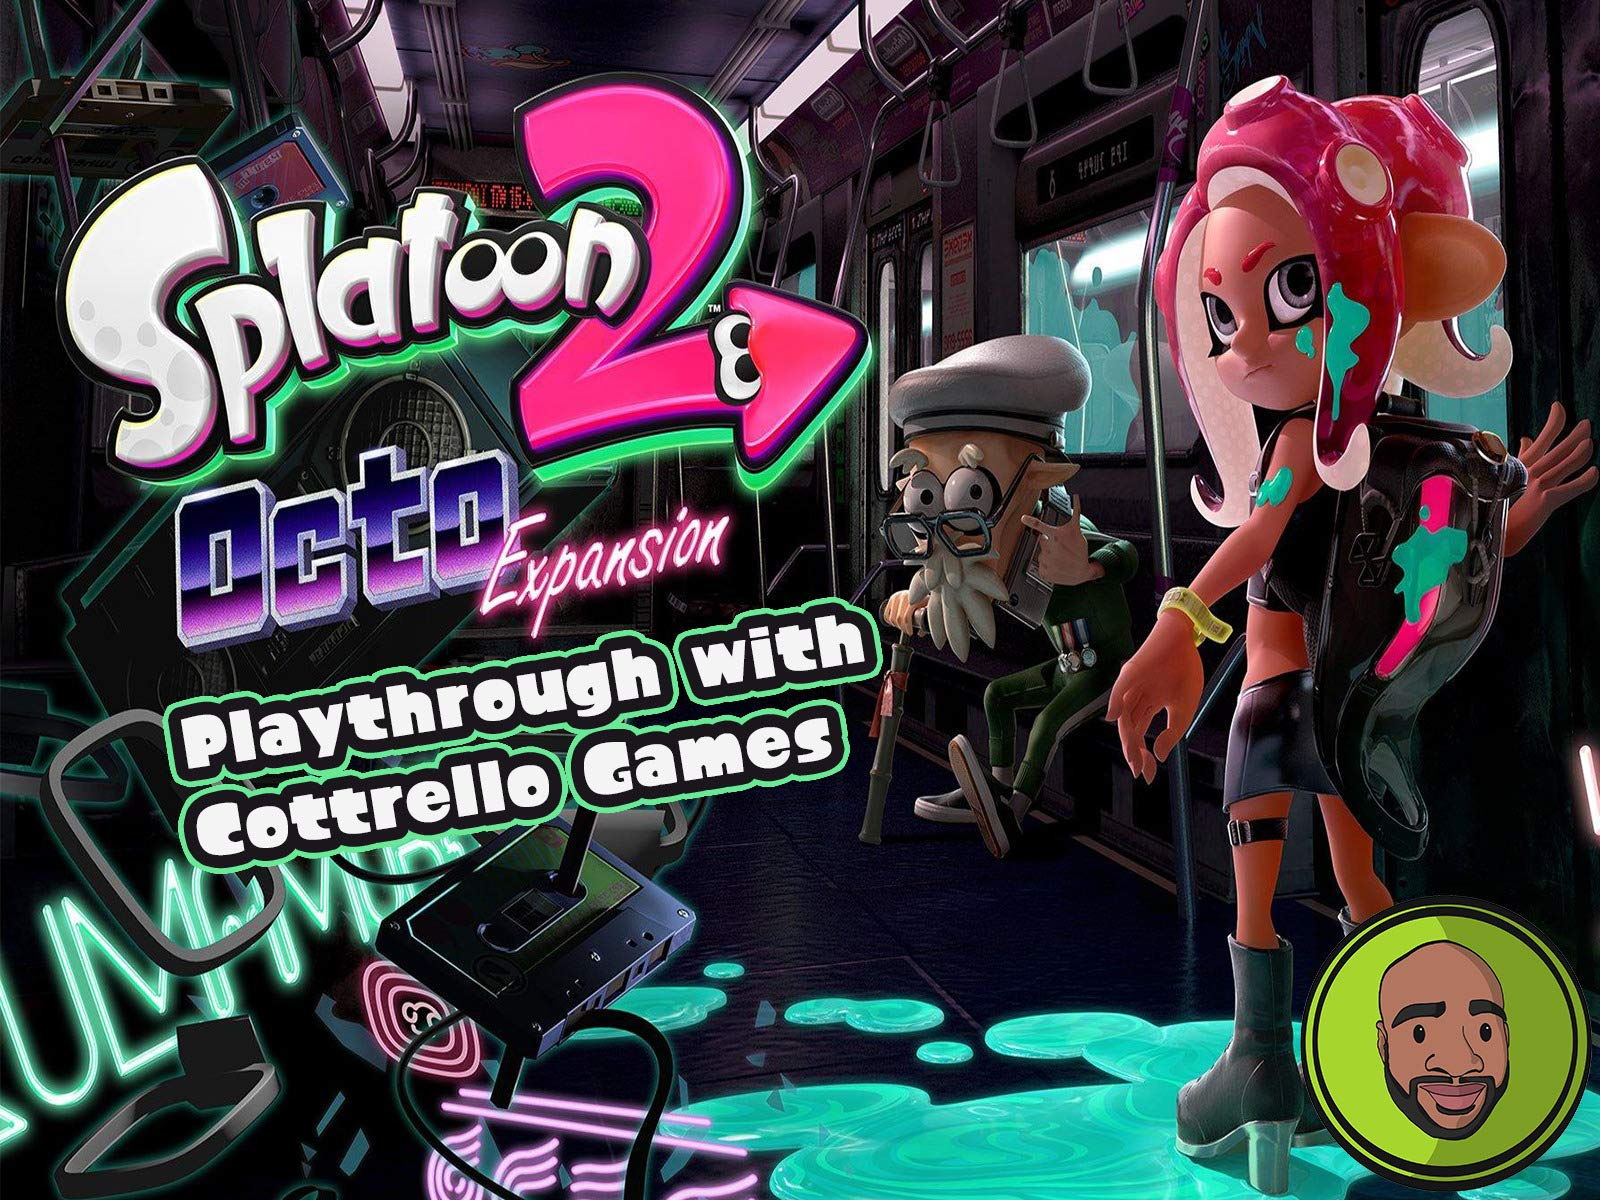 Splatoon 2 Octo-Expansion Playthrough with Cottrello Games - Season 1